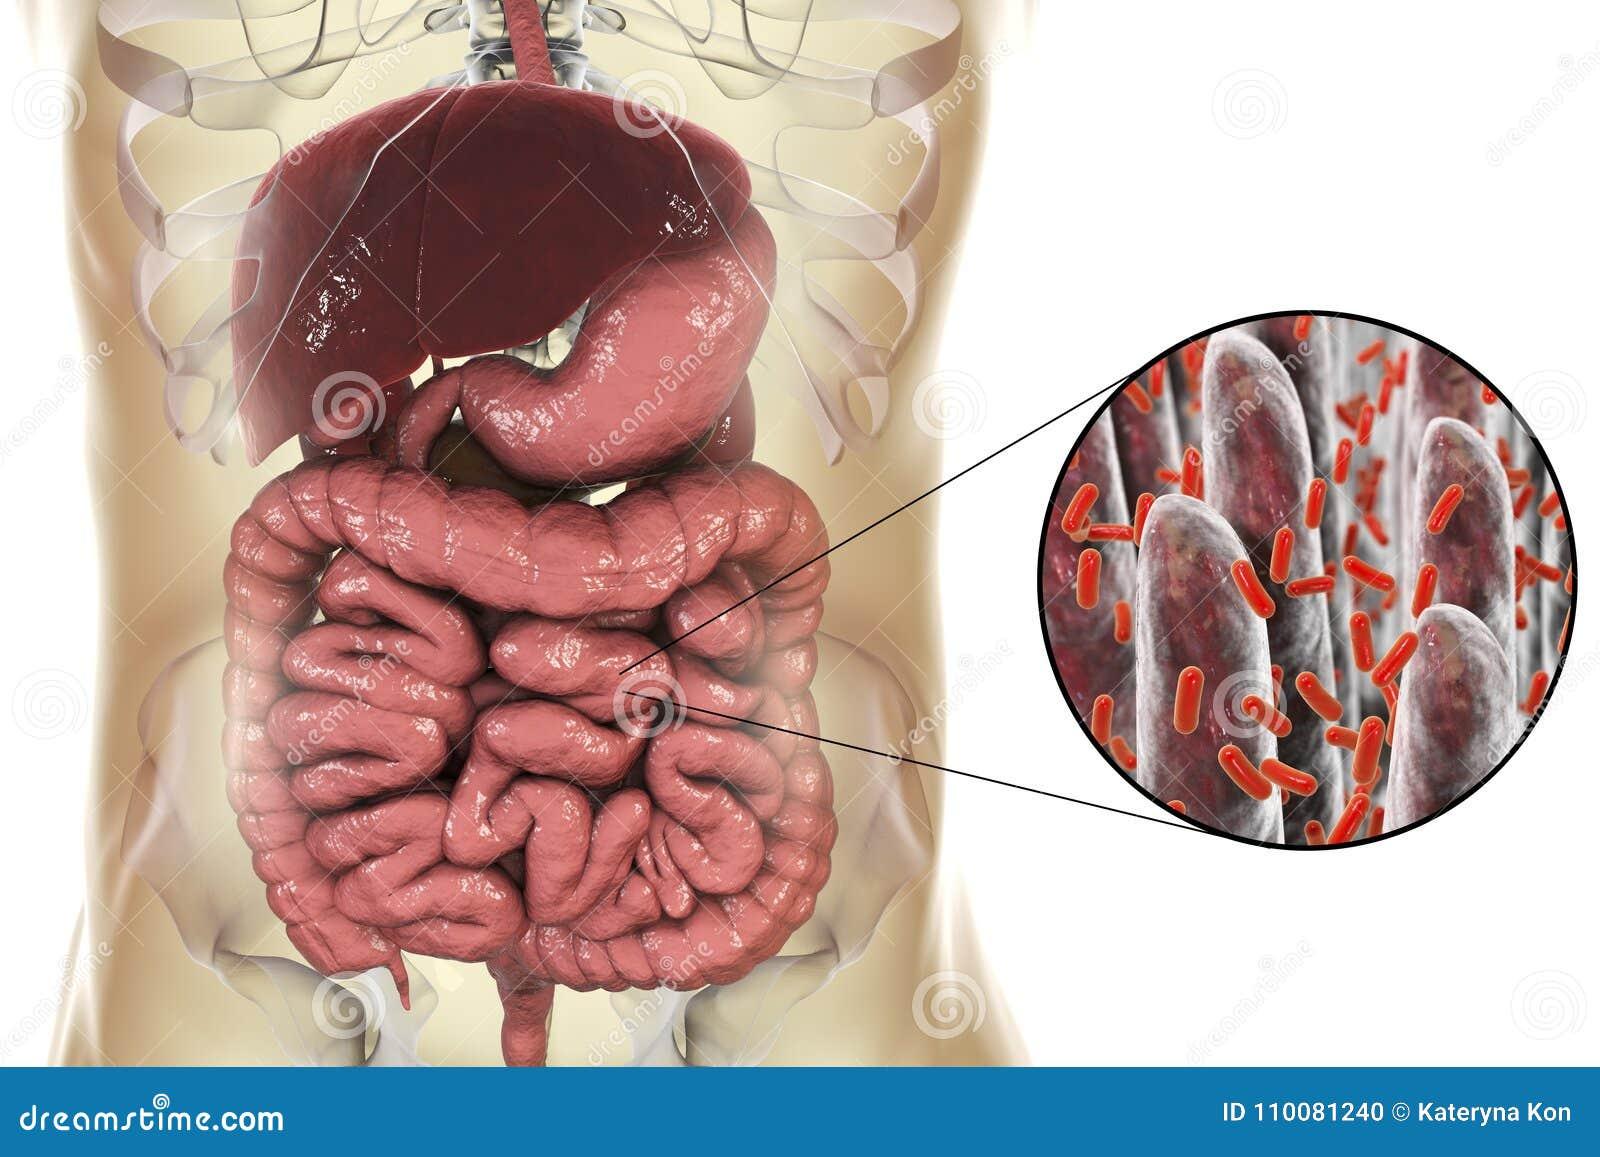 Intestinal Microbiome Close Up View Of Intestinal Villi And Enteric